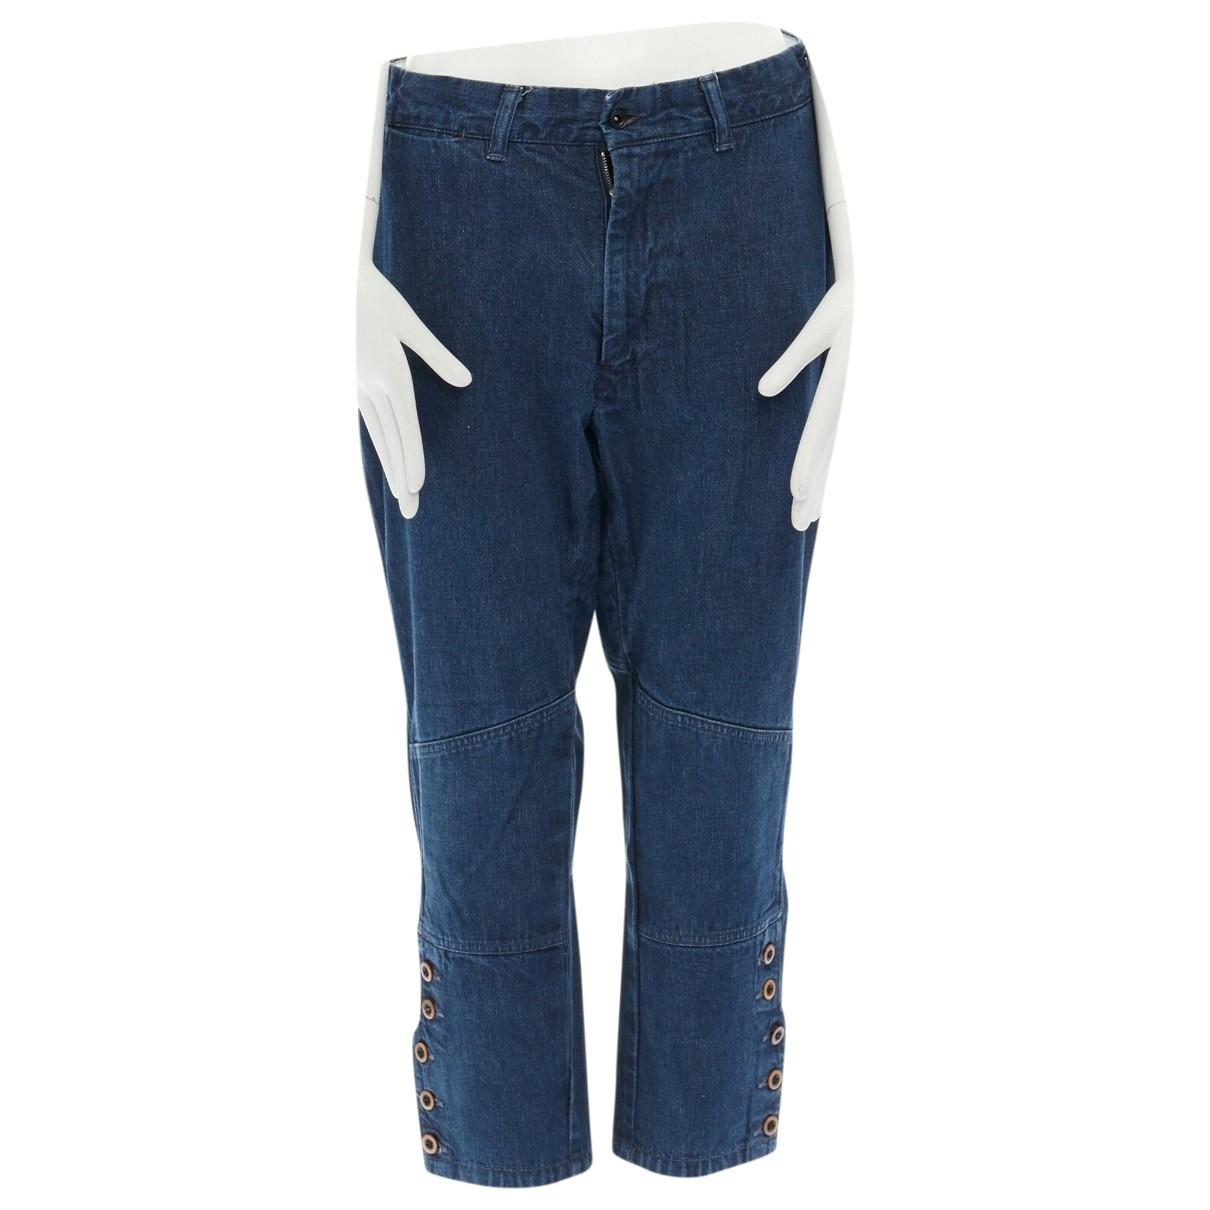 45rpm \N Blue Denim - Jeans Jeans for Women 38 FR